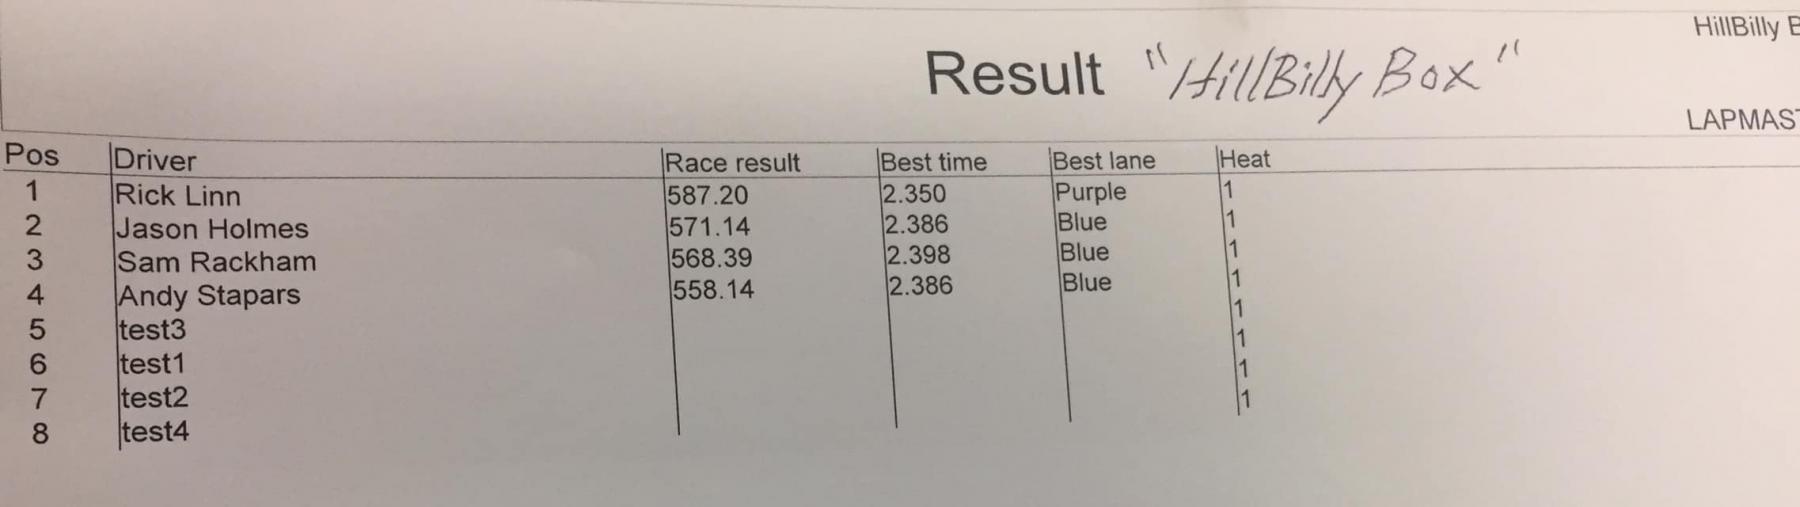 142020 hillbox results.jpg